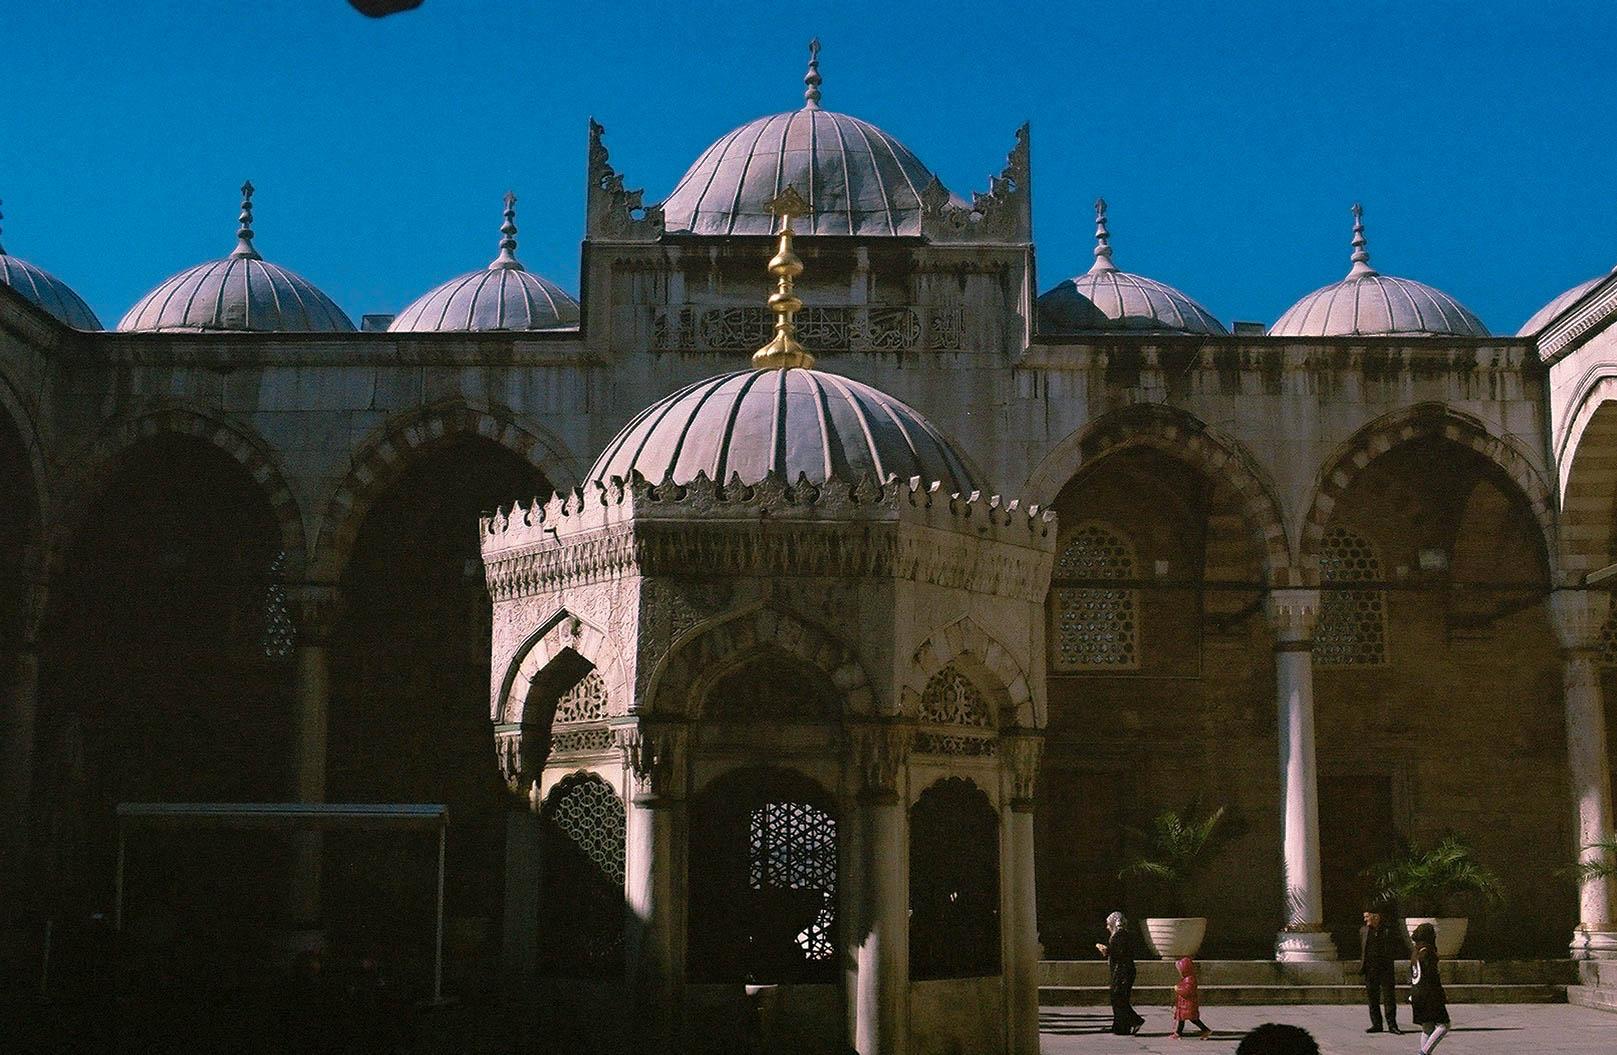 Yeni Cami Mosque, Istanbul, Turkey | Leica R4 35mm